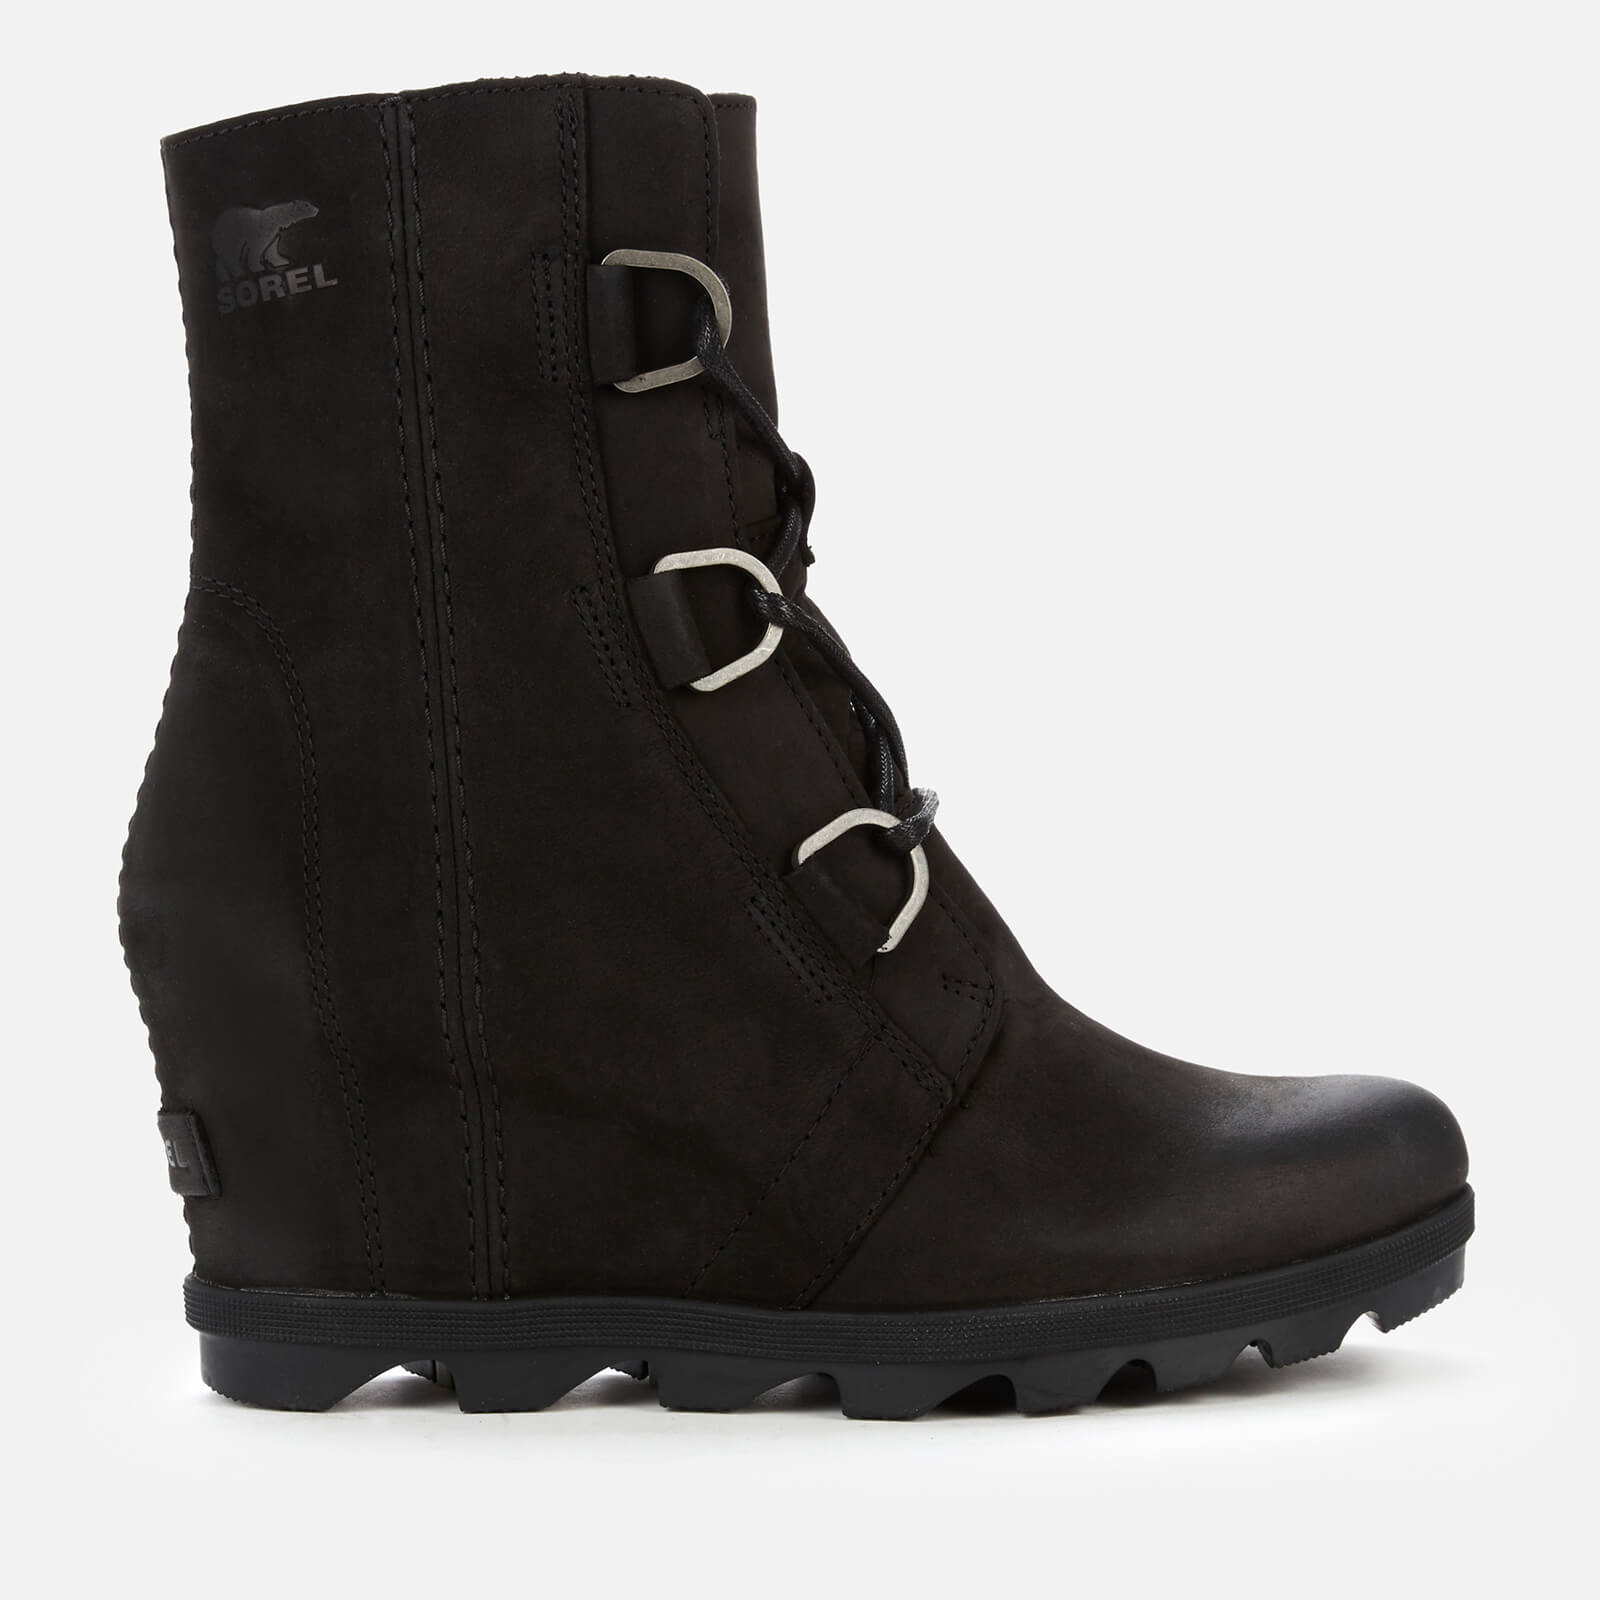 Sorel Women's Joan Of Arctic Ii Waterproof Leather Wedged Boots - Black - Uk 3